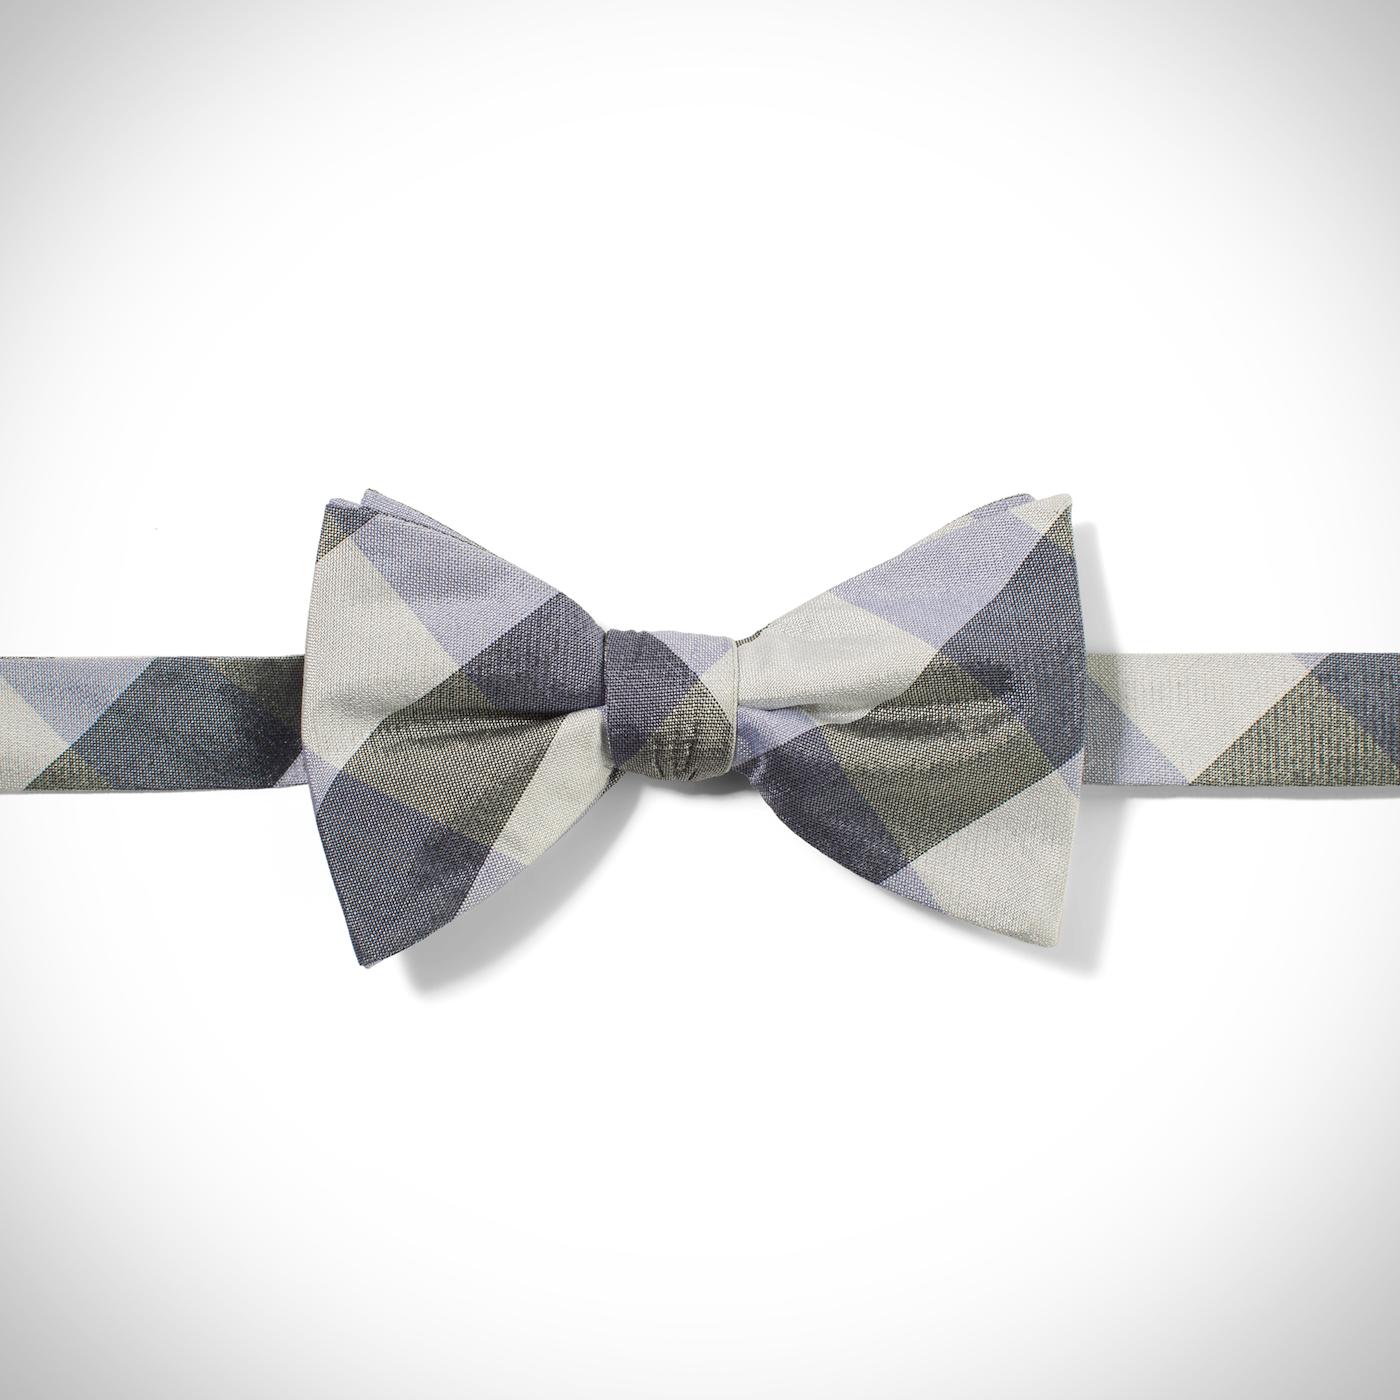 Lilac Buffalo Plaid Pre-Tied Bow Tie